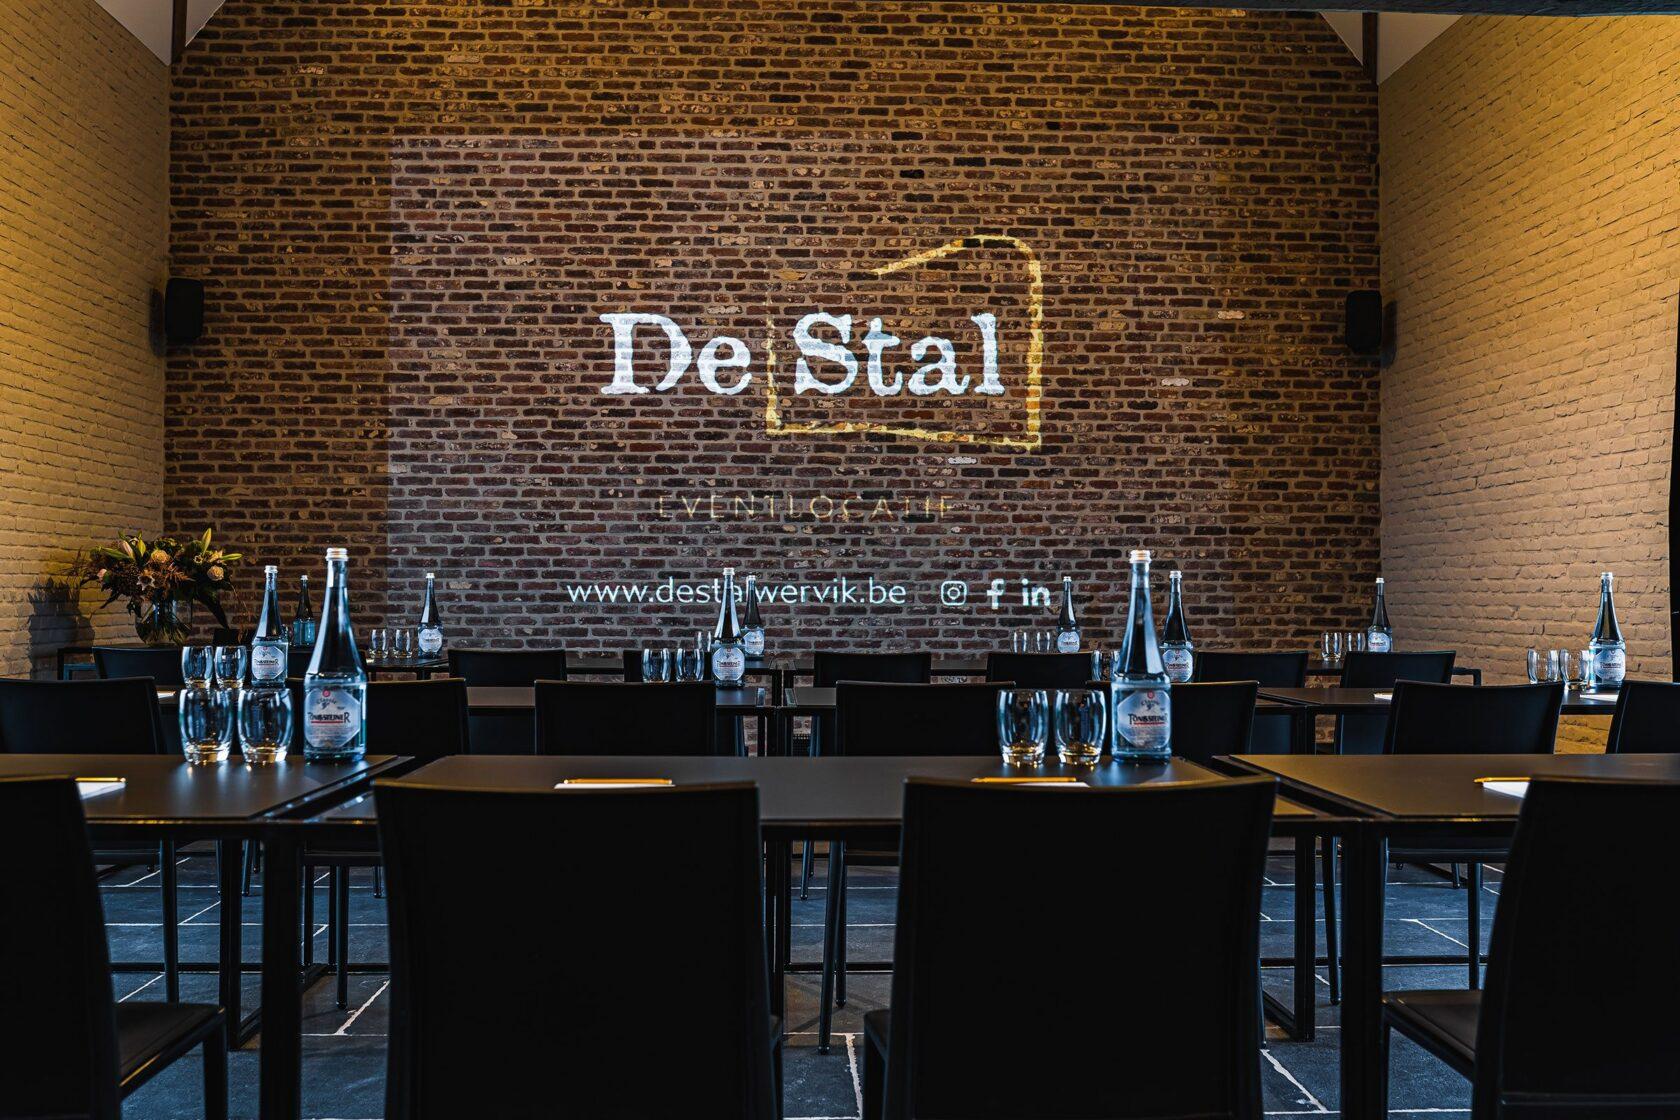 Destal Wervik Business 13